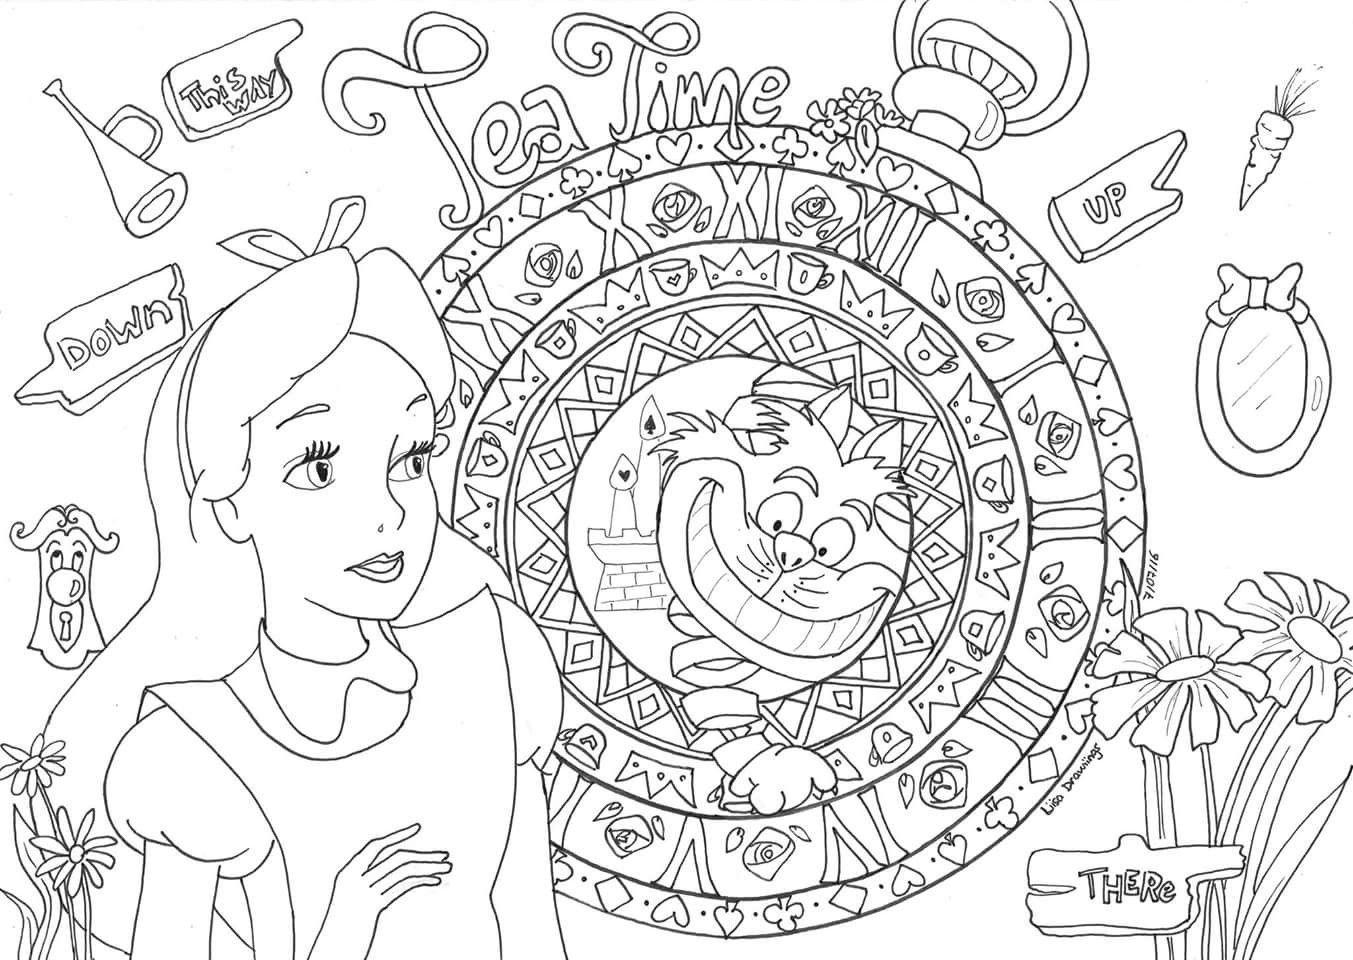 Coloriage Coloriage Disney A Imprimer Disney Coloring Pages Printables Disney Coloring Pages Cartoon Coloring Pages